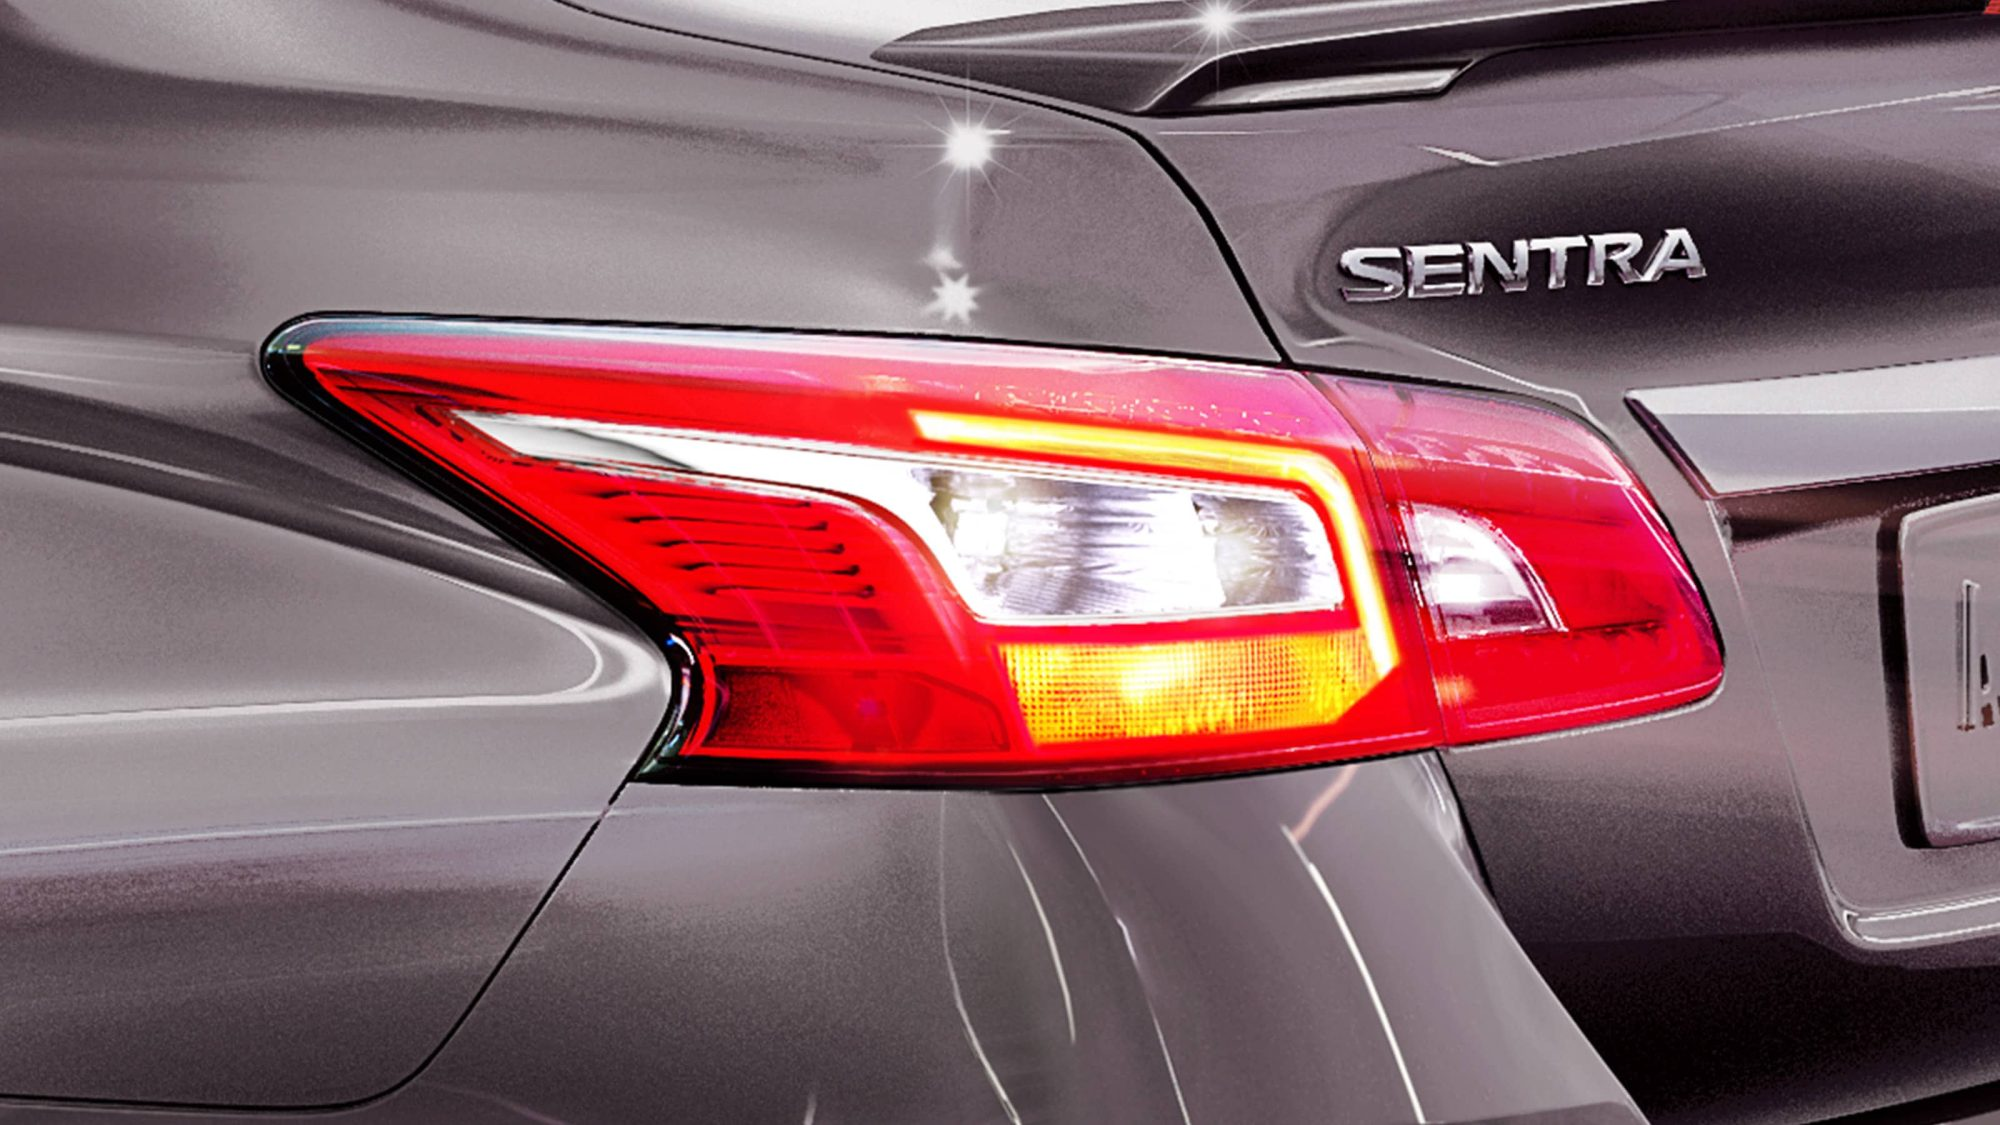 hight resolution of nissan sentra taillights